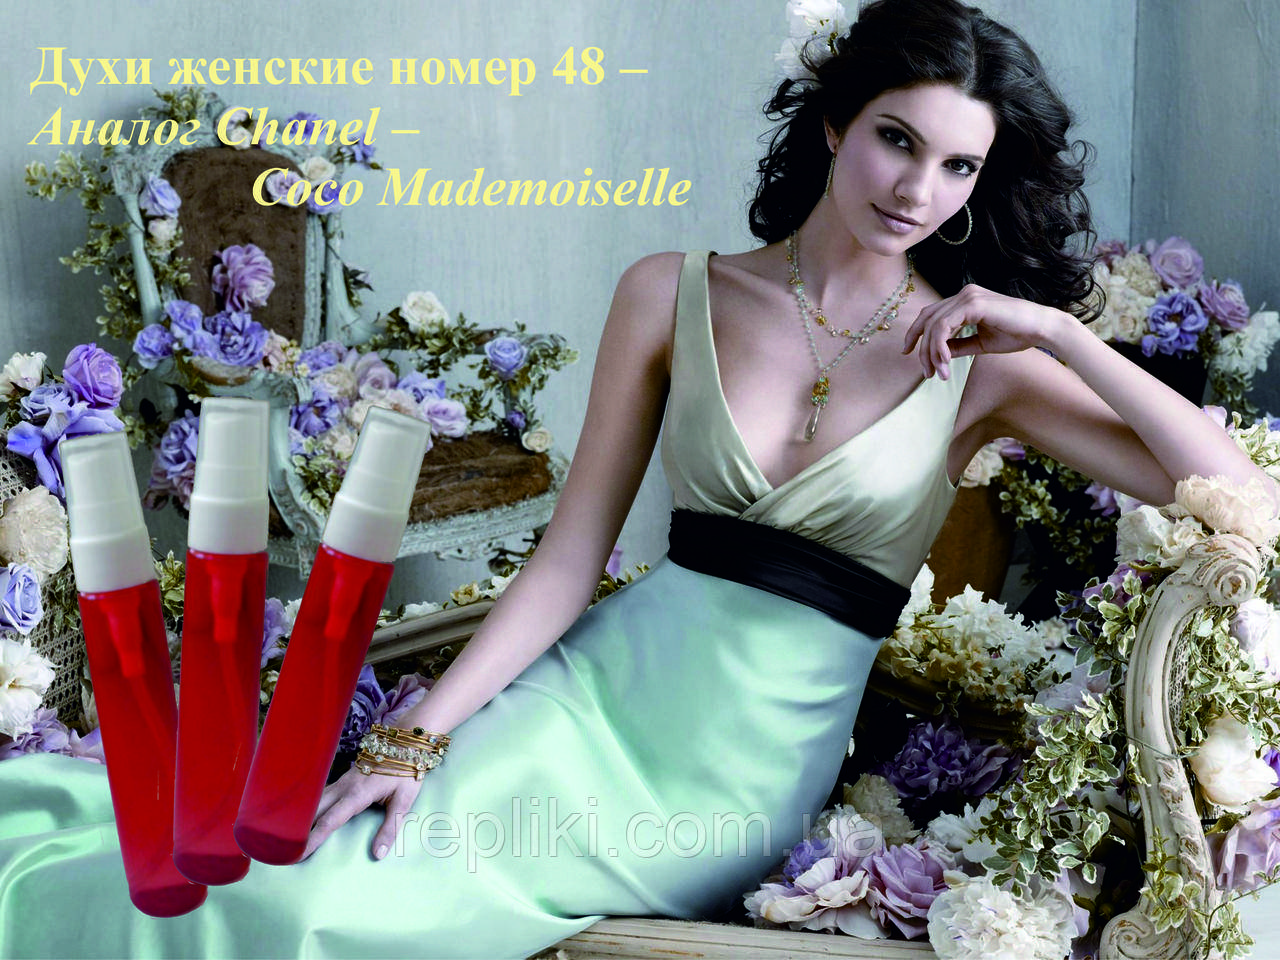 ЛЮКС Копии. Стойкость до 12 ч!!! Франция.Духи женские номер 48 – аналог Chanel – Coco Mademoiselle-23мл, фото 1